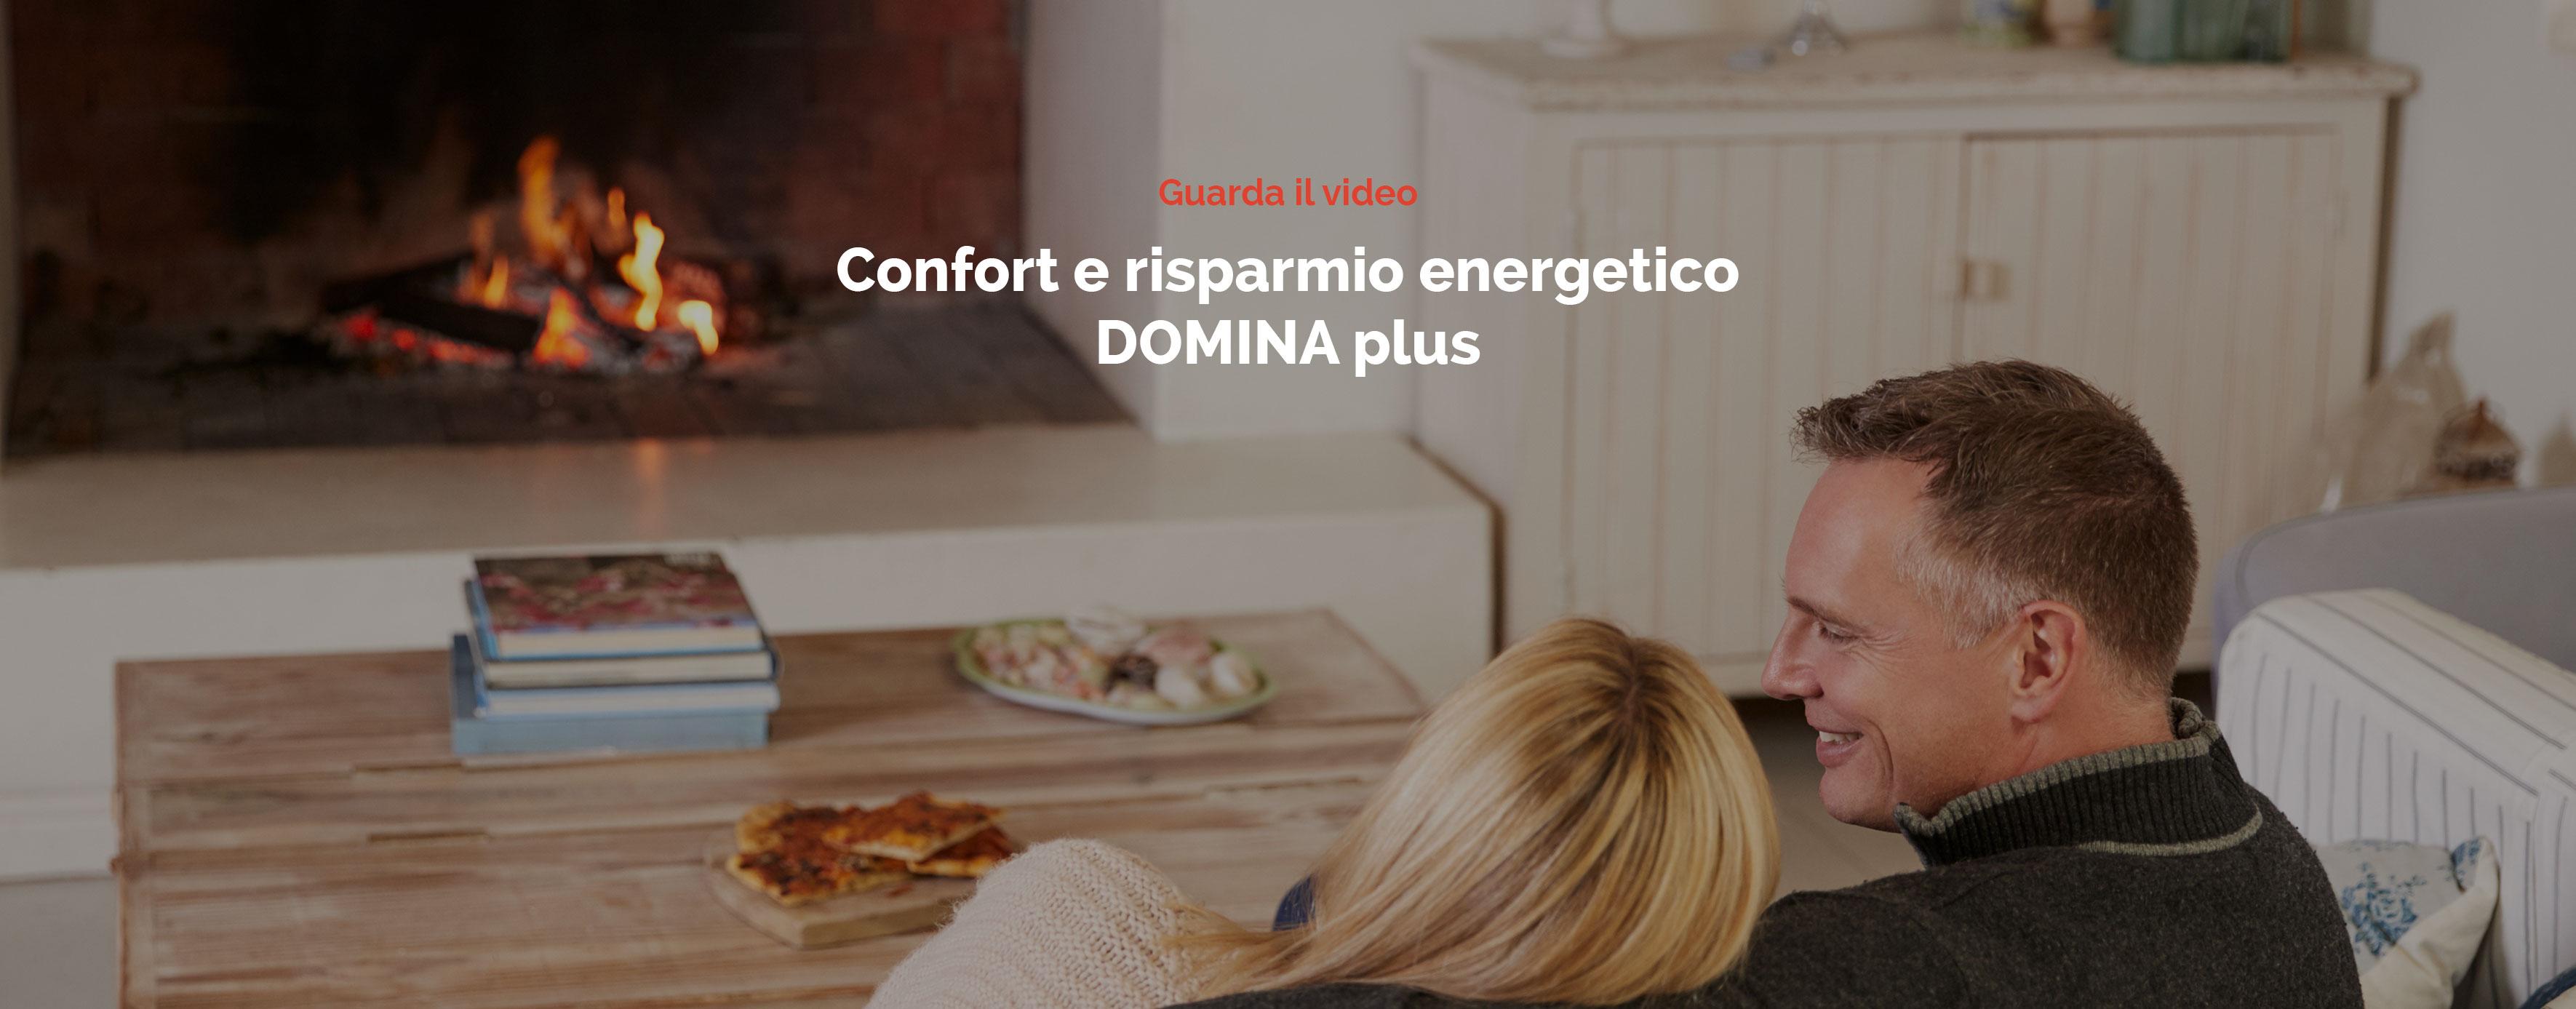 Video Domotica Confort e Risparmio Energetico - Ave Domina Plus